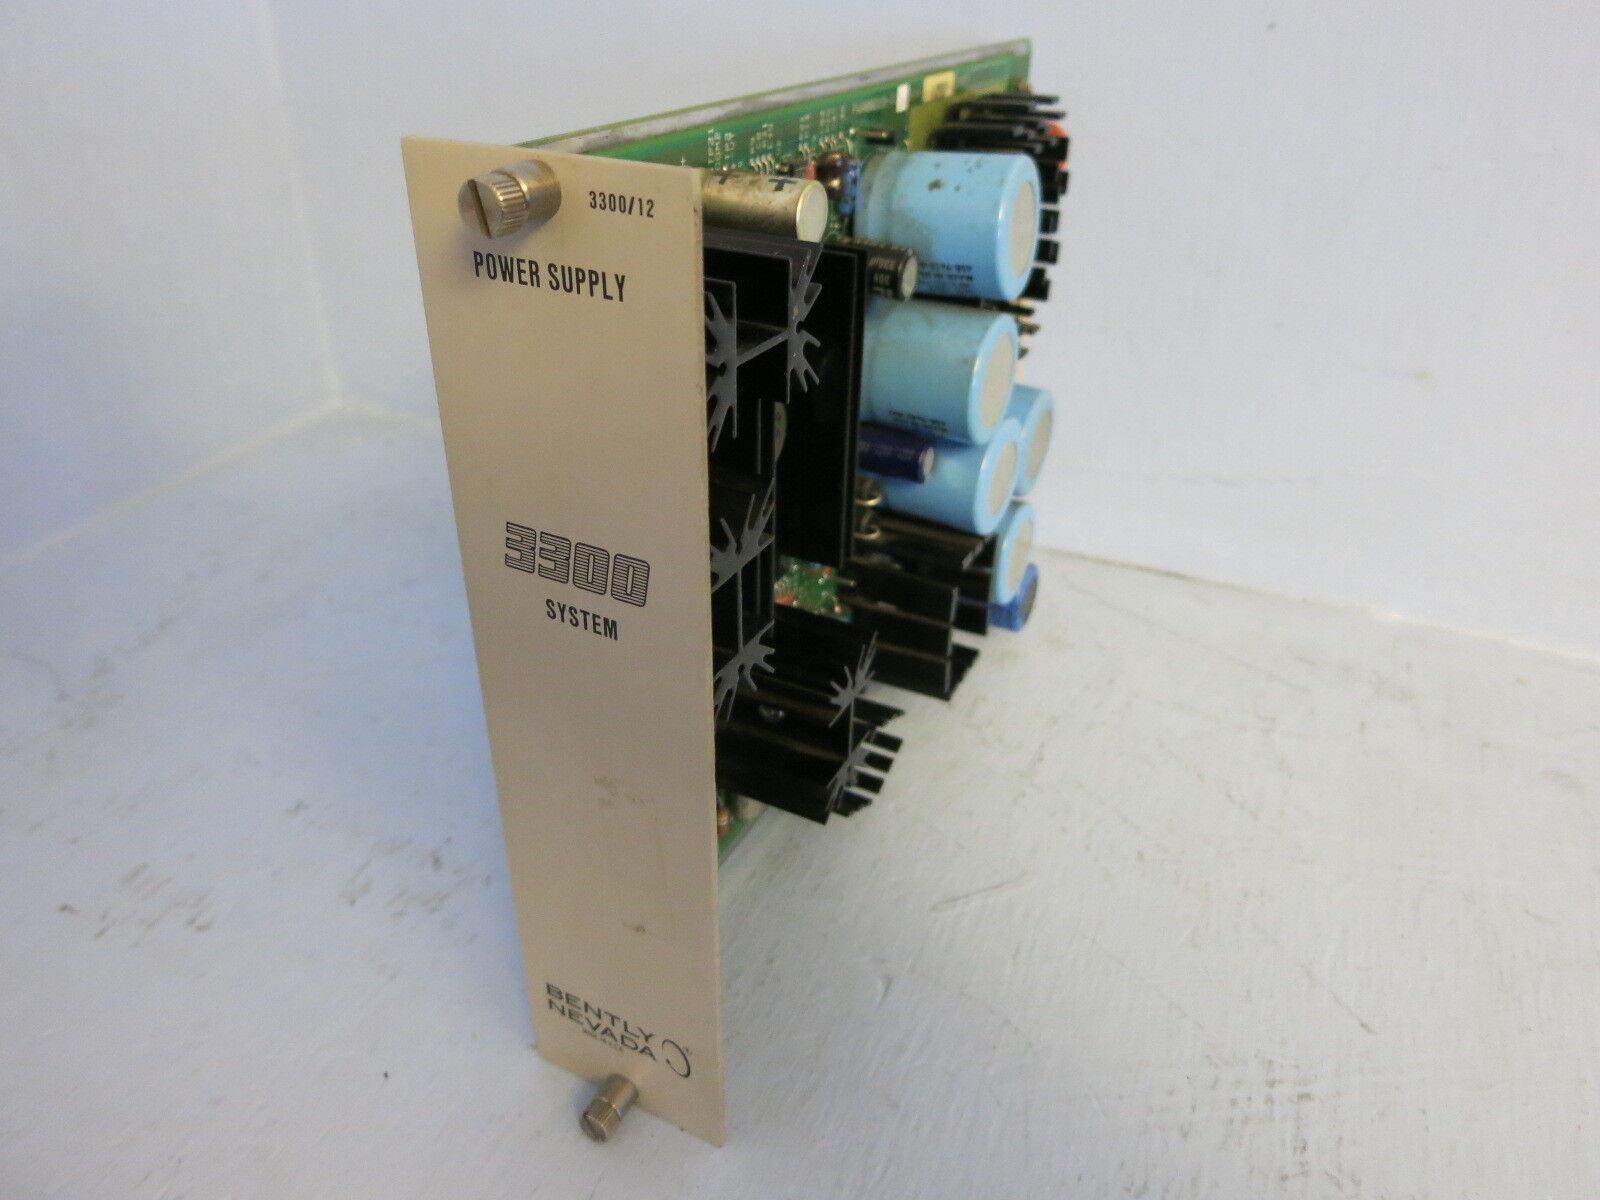 Bently Nevada Power Supply 3300 12-01-20-00 PLC PWA88219-01 78591-01A Bentley